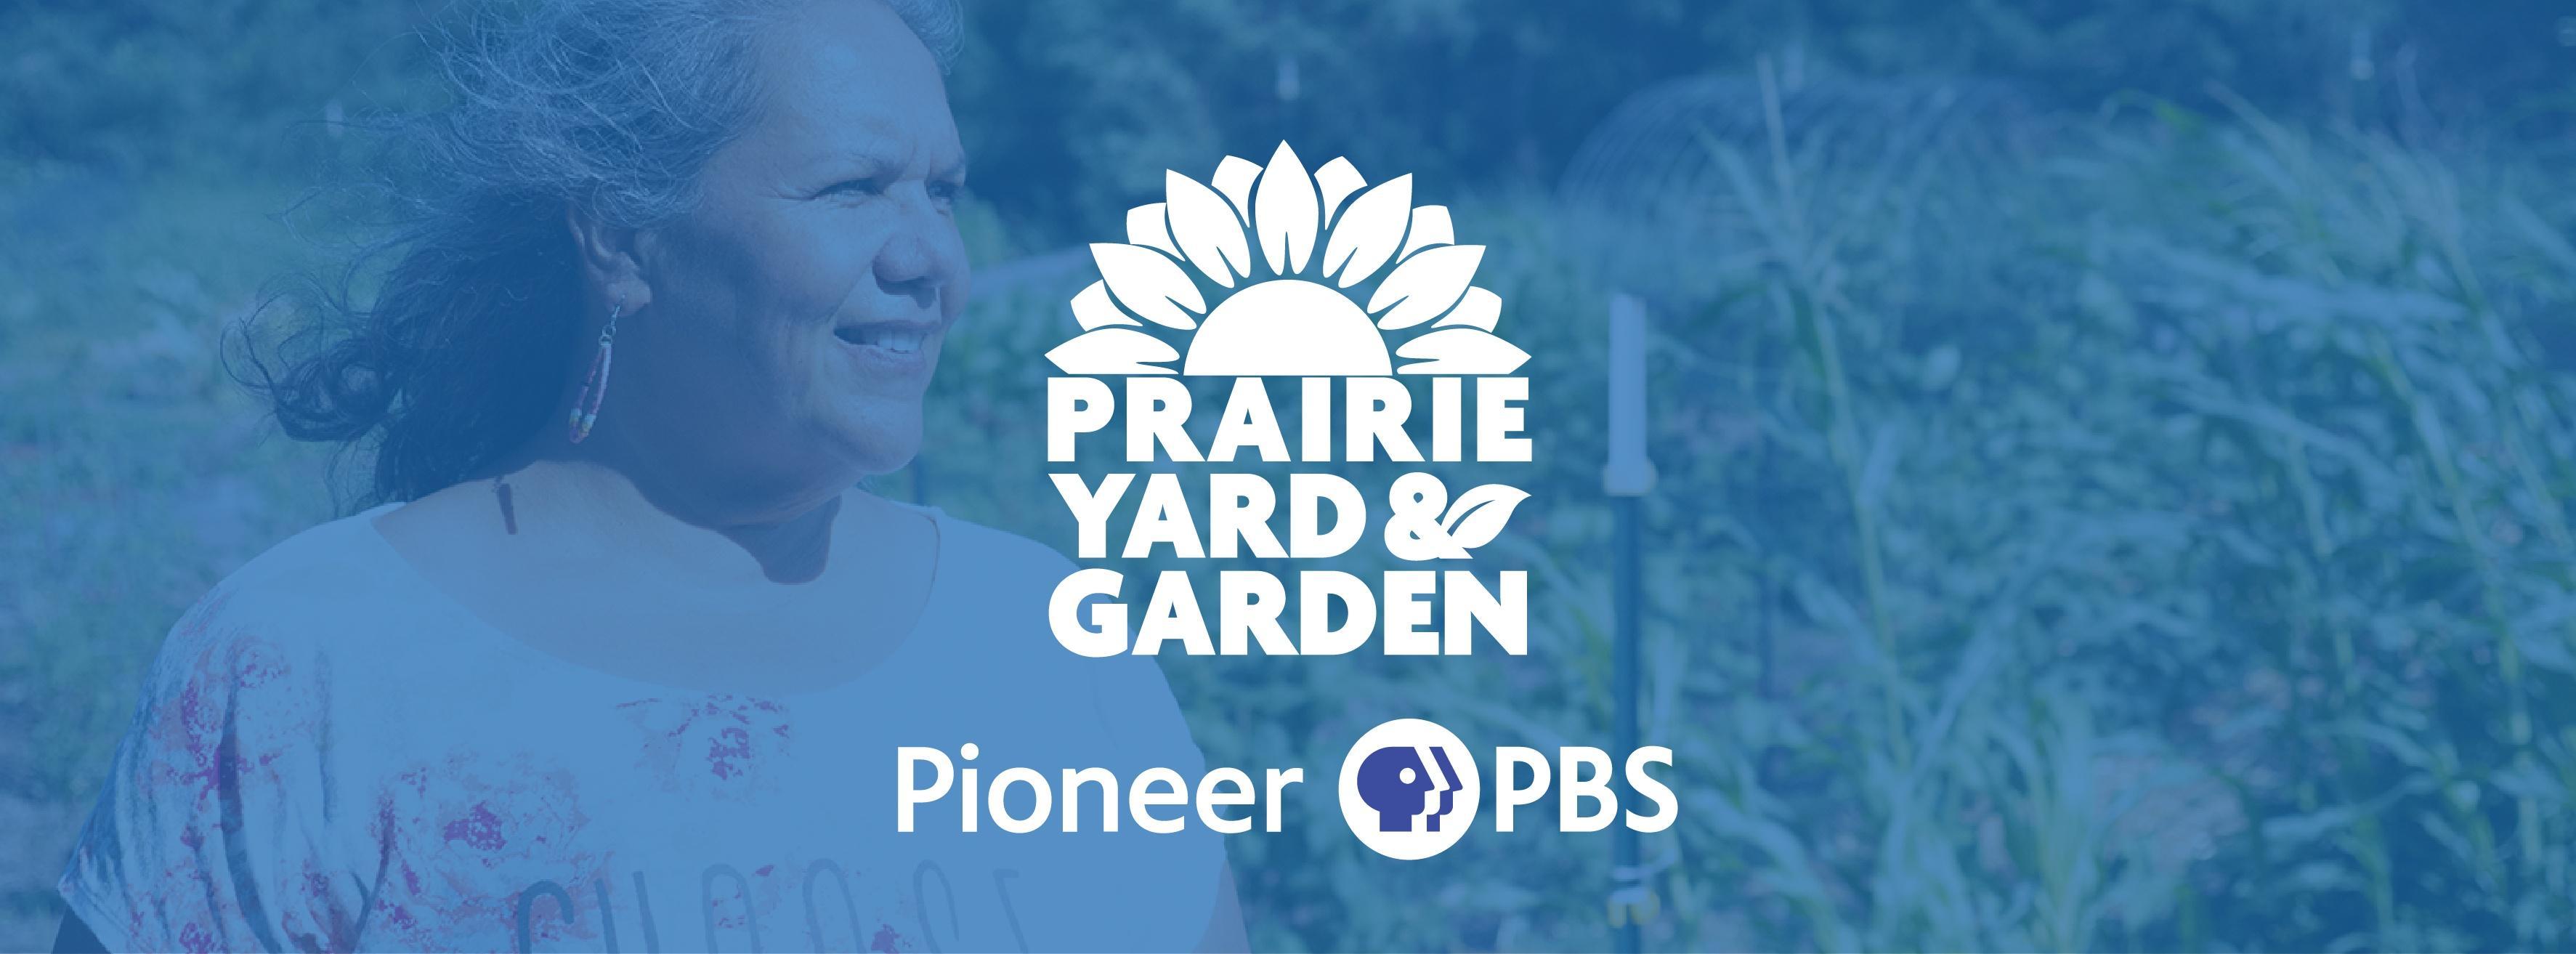 33rd Season of Prairie Yard & Garden